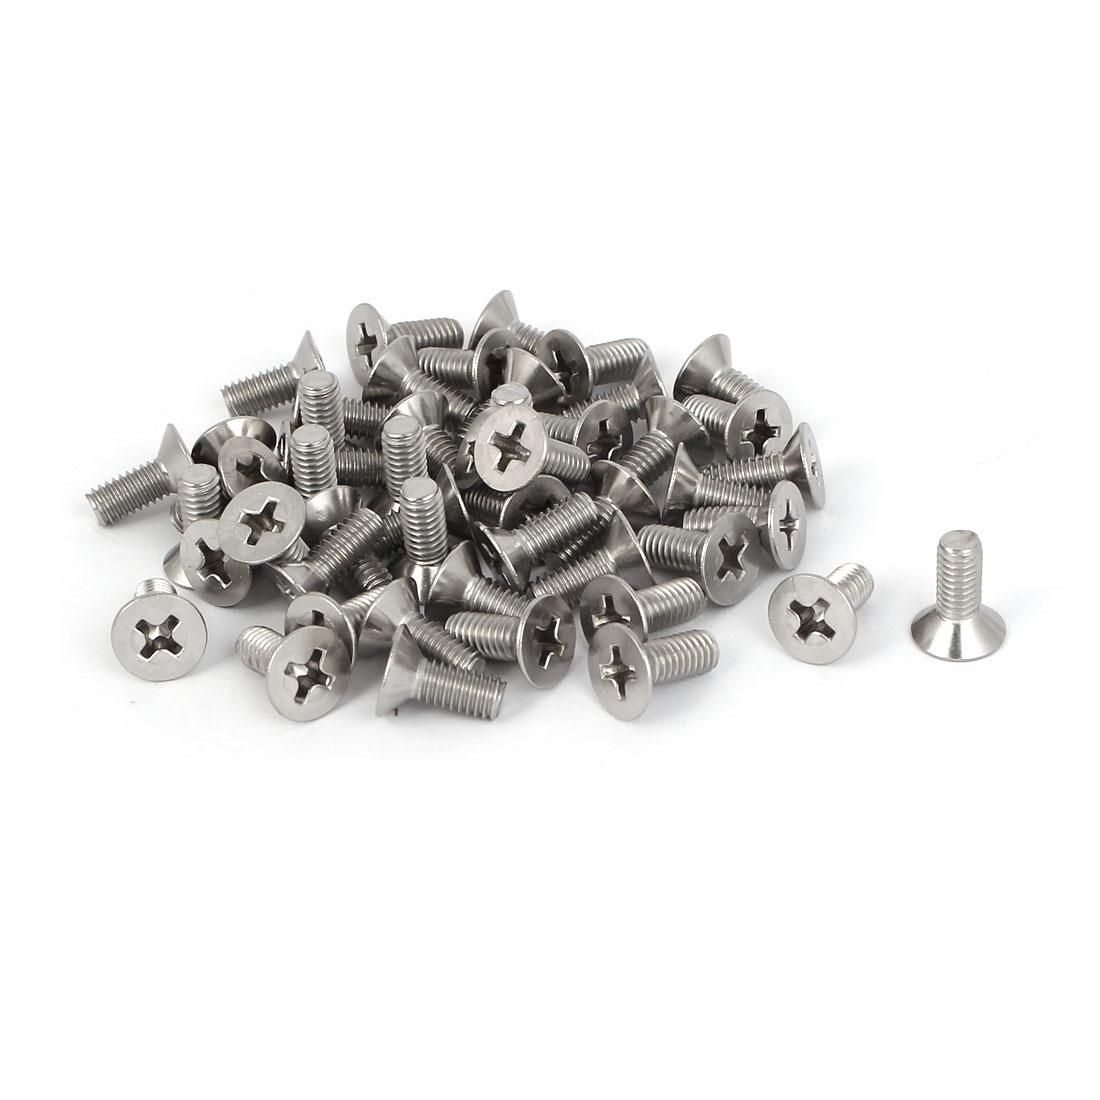 50 Pcs M4x10mm 316 Stainless Steel Flat Head Phillips Machine Screws Bolts